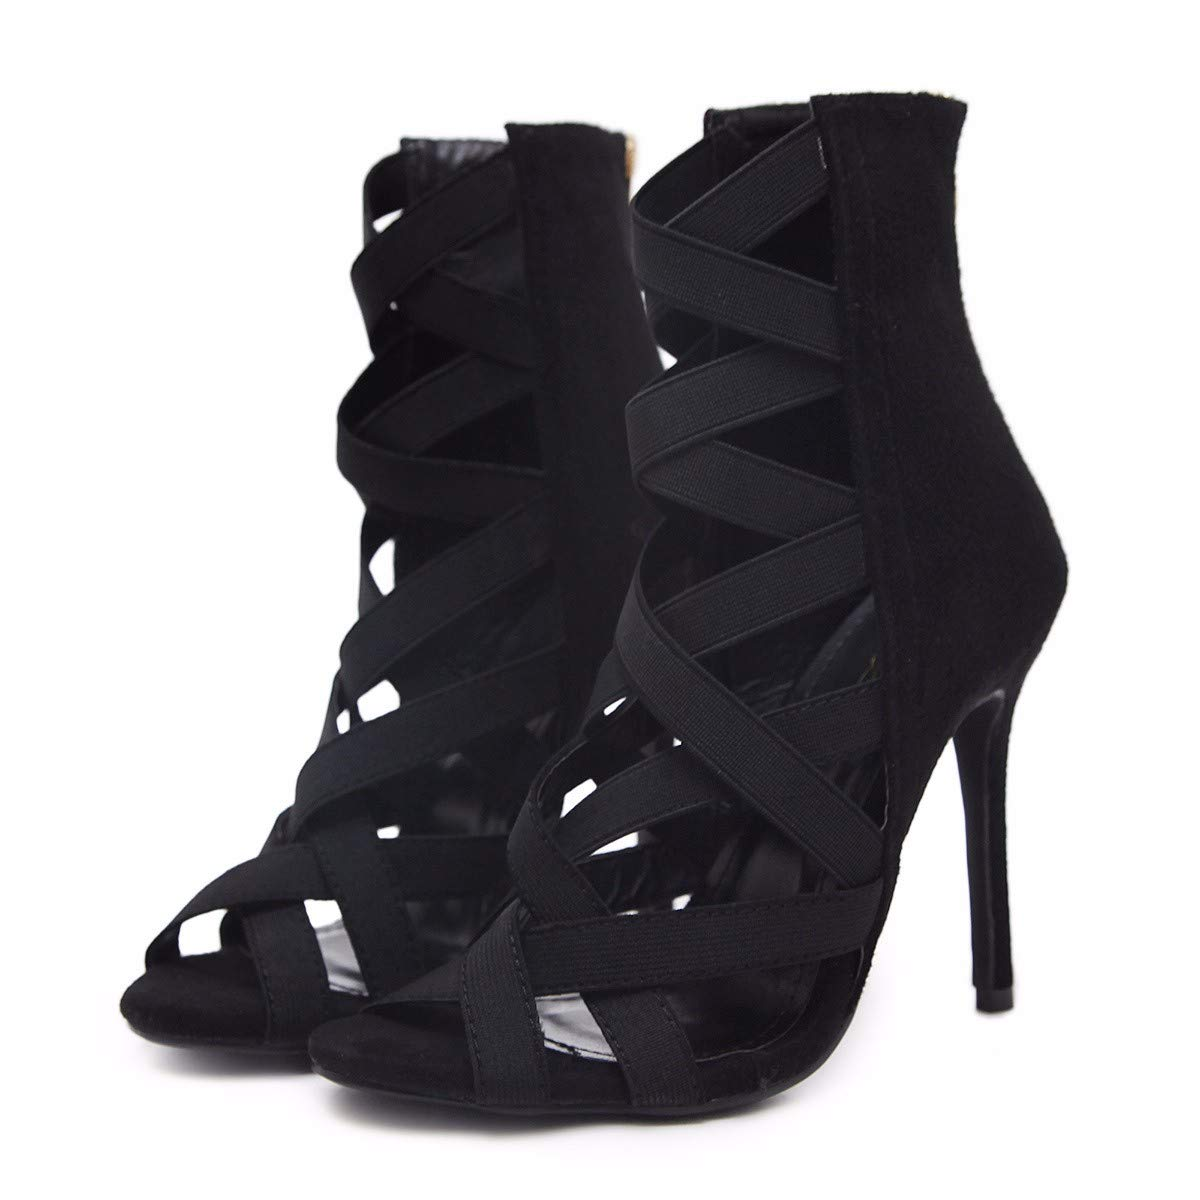 KOKQSX-Damenschuhe europäischen und amerikanischen Sandalen Mode high Heels